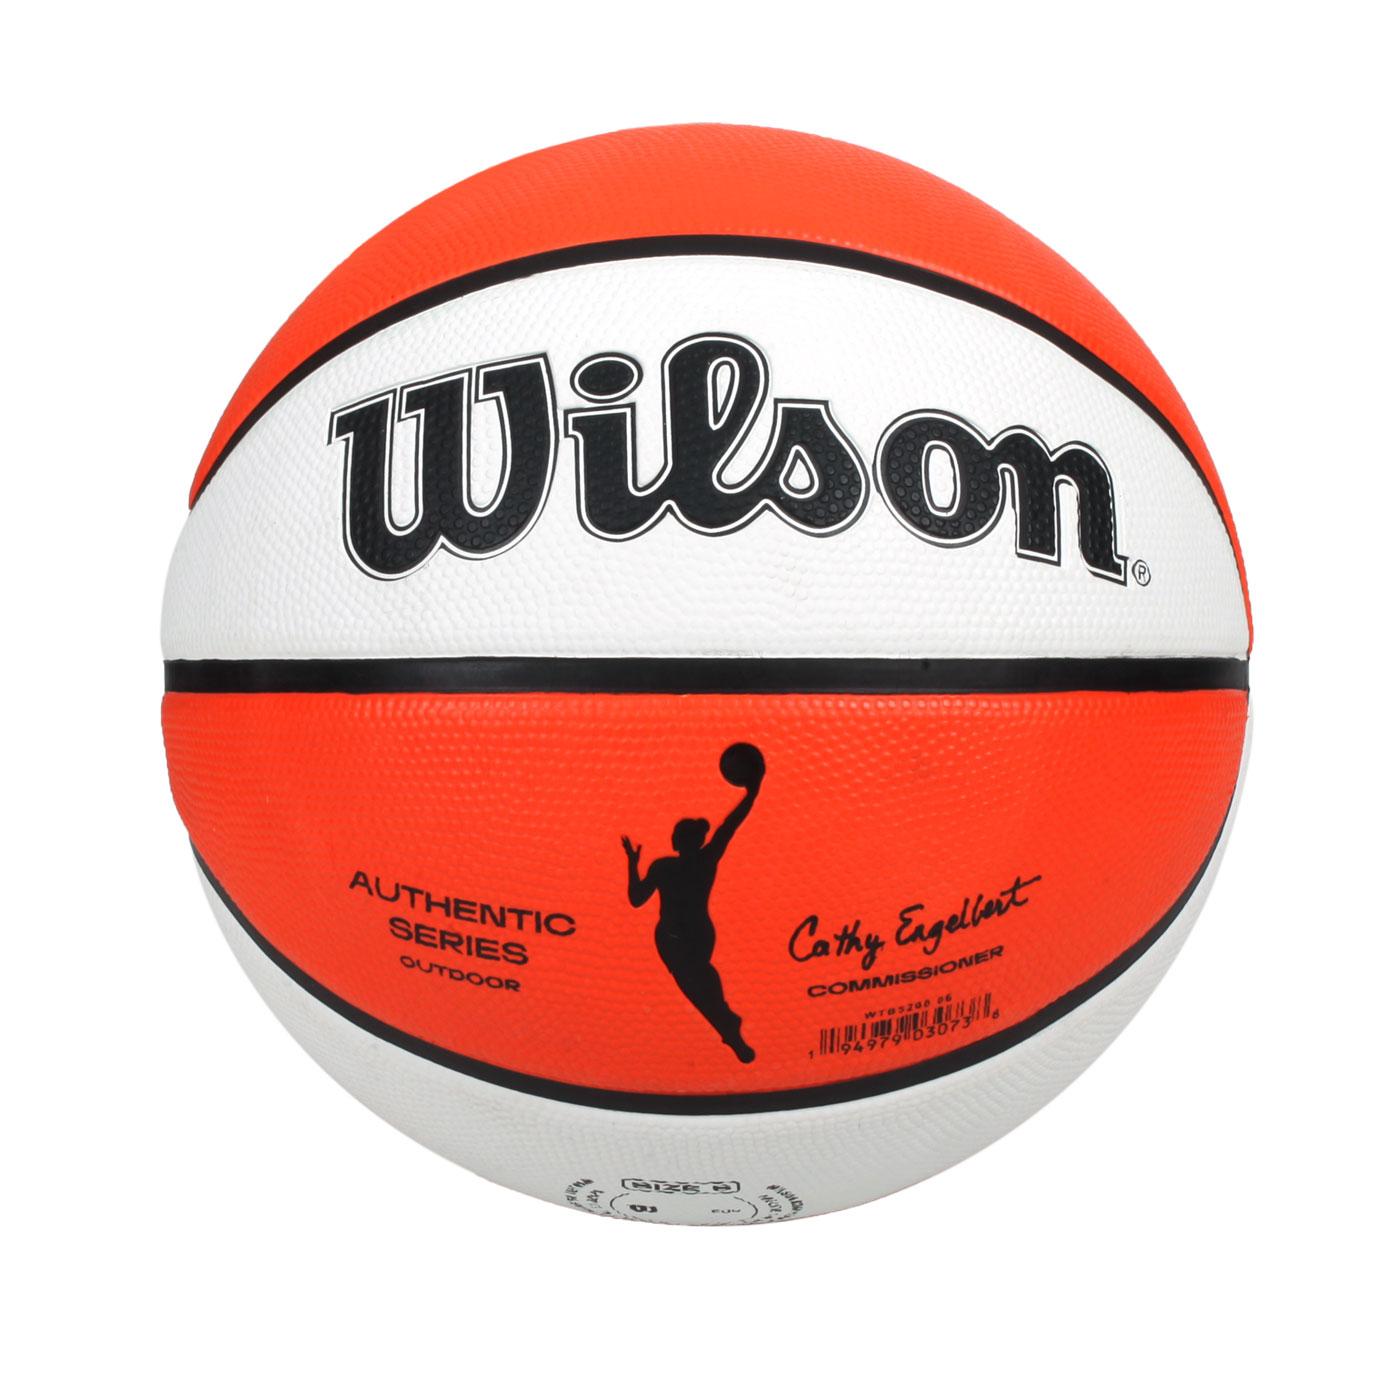 WILSON WNBA AUTH系列室外橡膠籃球#6 WTB5200XB06